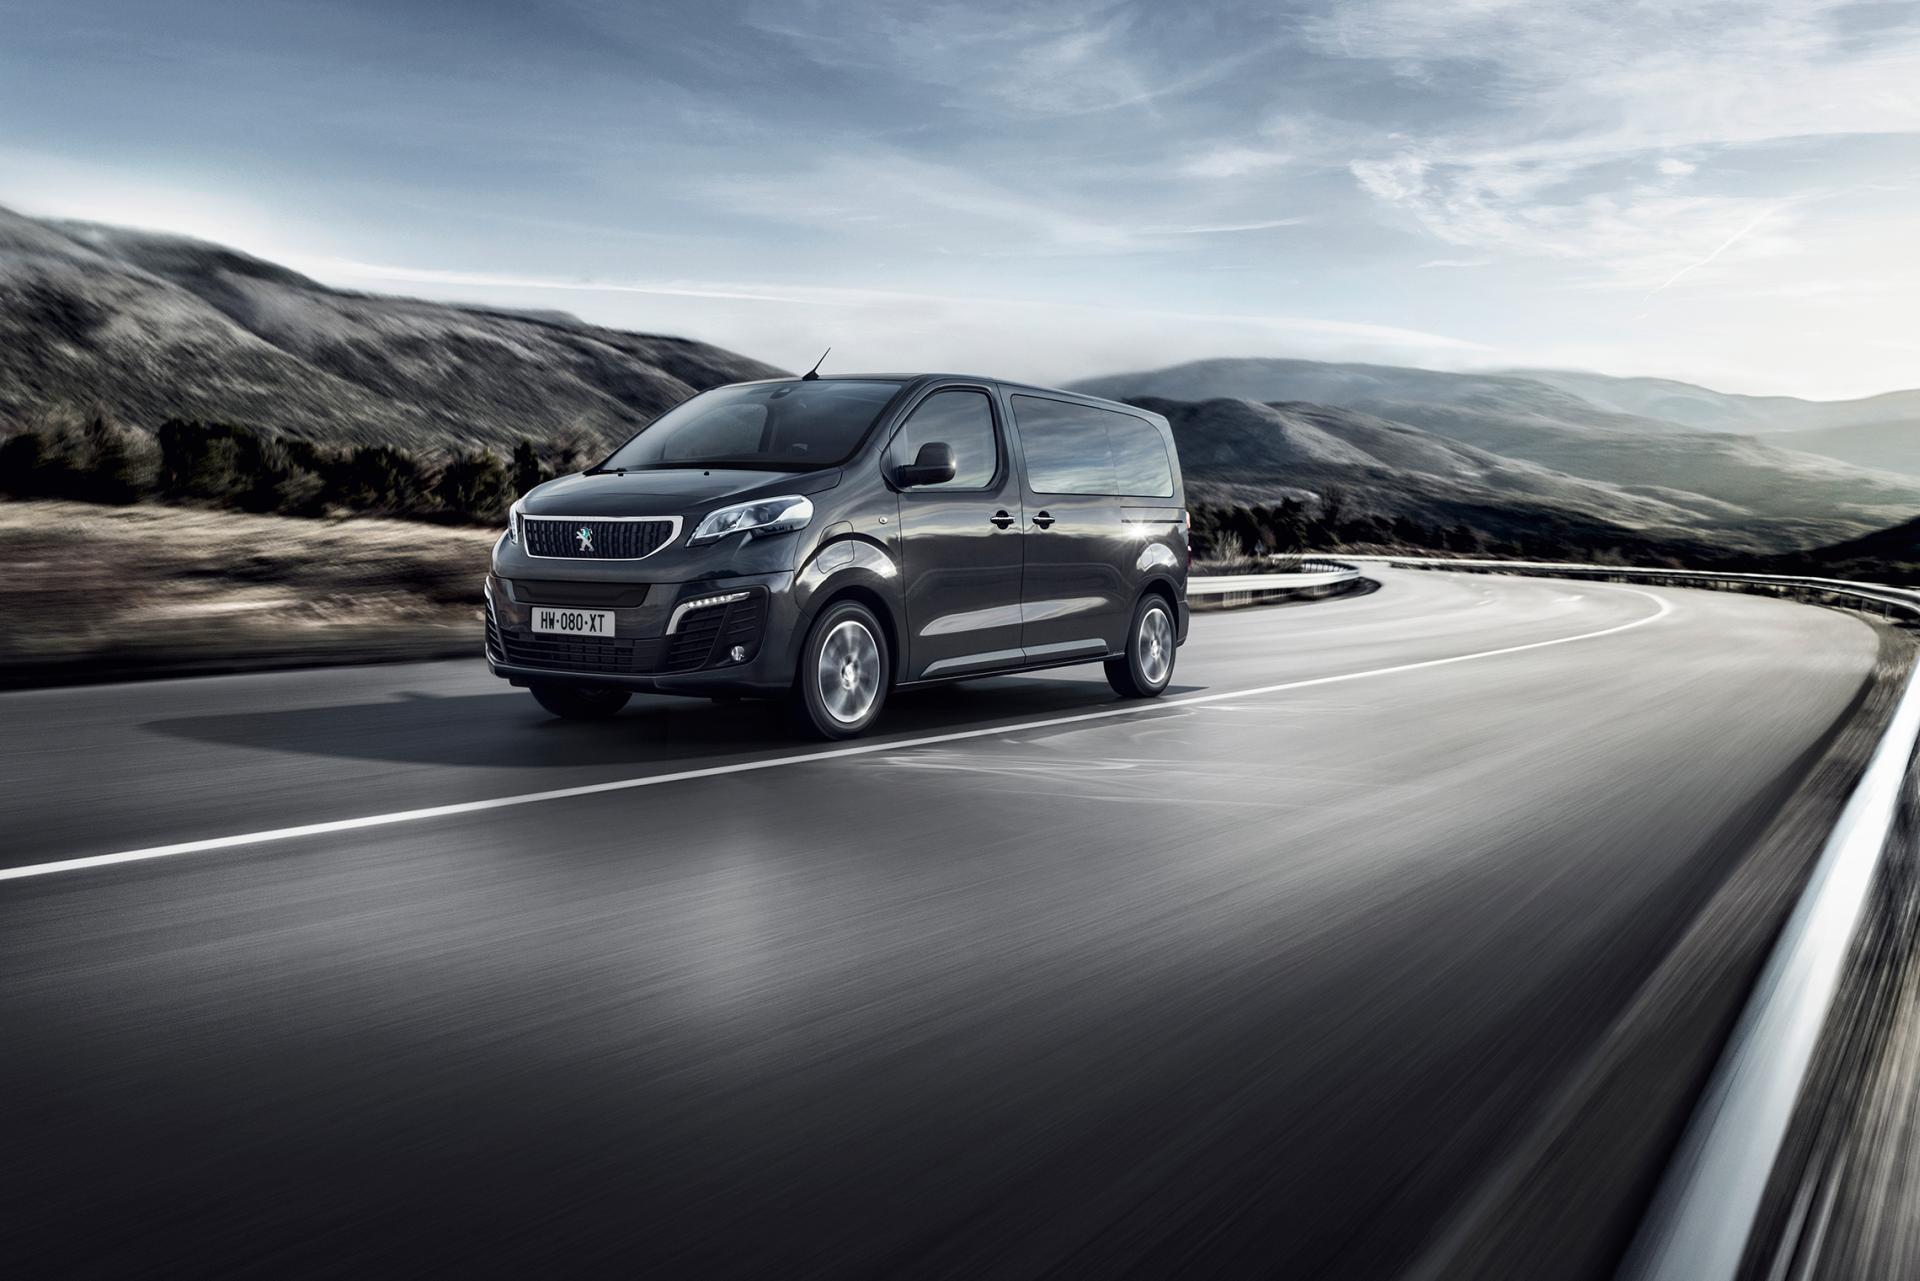 Peugeot-Kleinbusse auch mit 75-kWh-Batterie